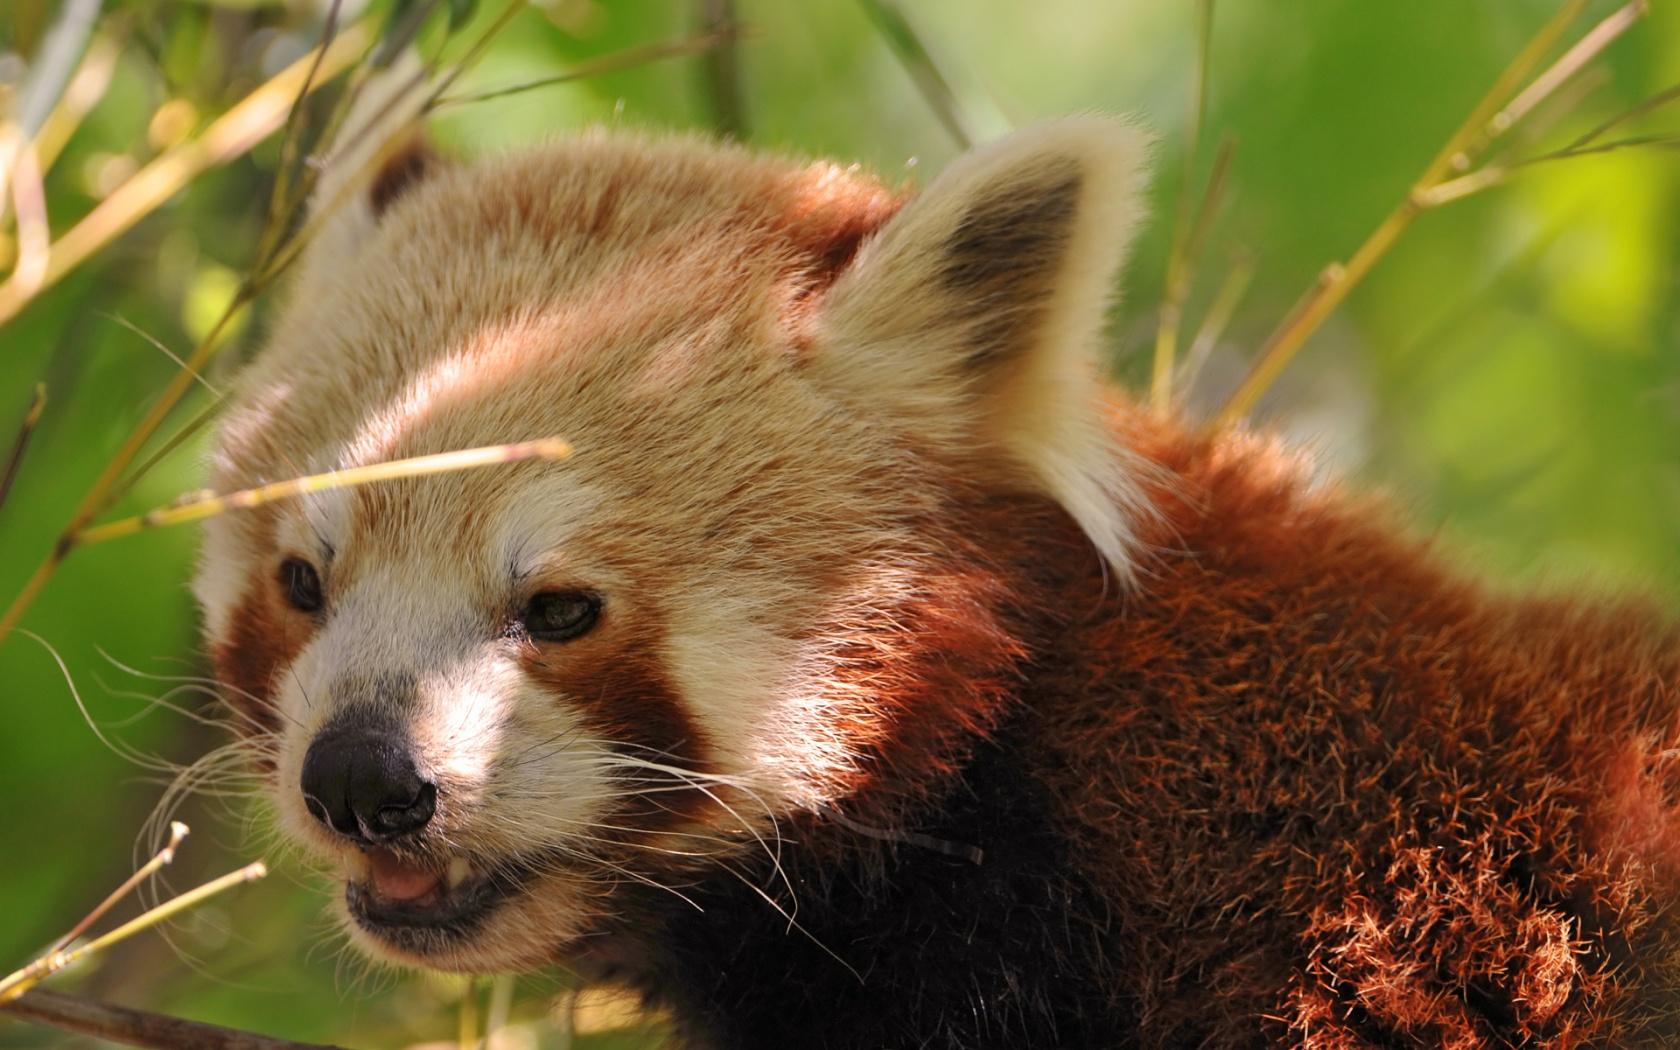 Cute Red Panda Wallpaper - WallpaperSafari | 1680 x 1050 jpeg 508kB